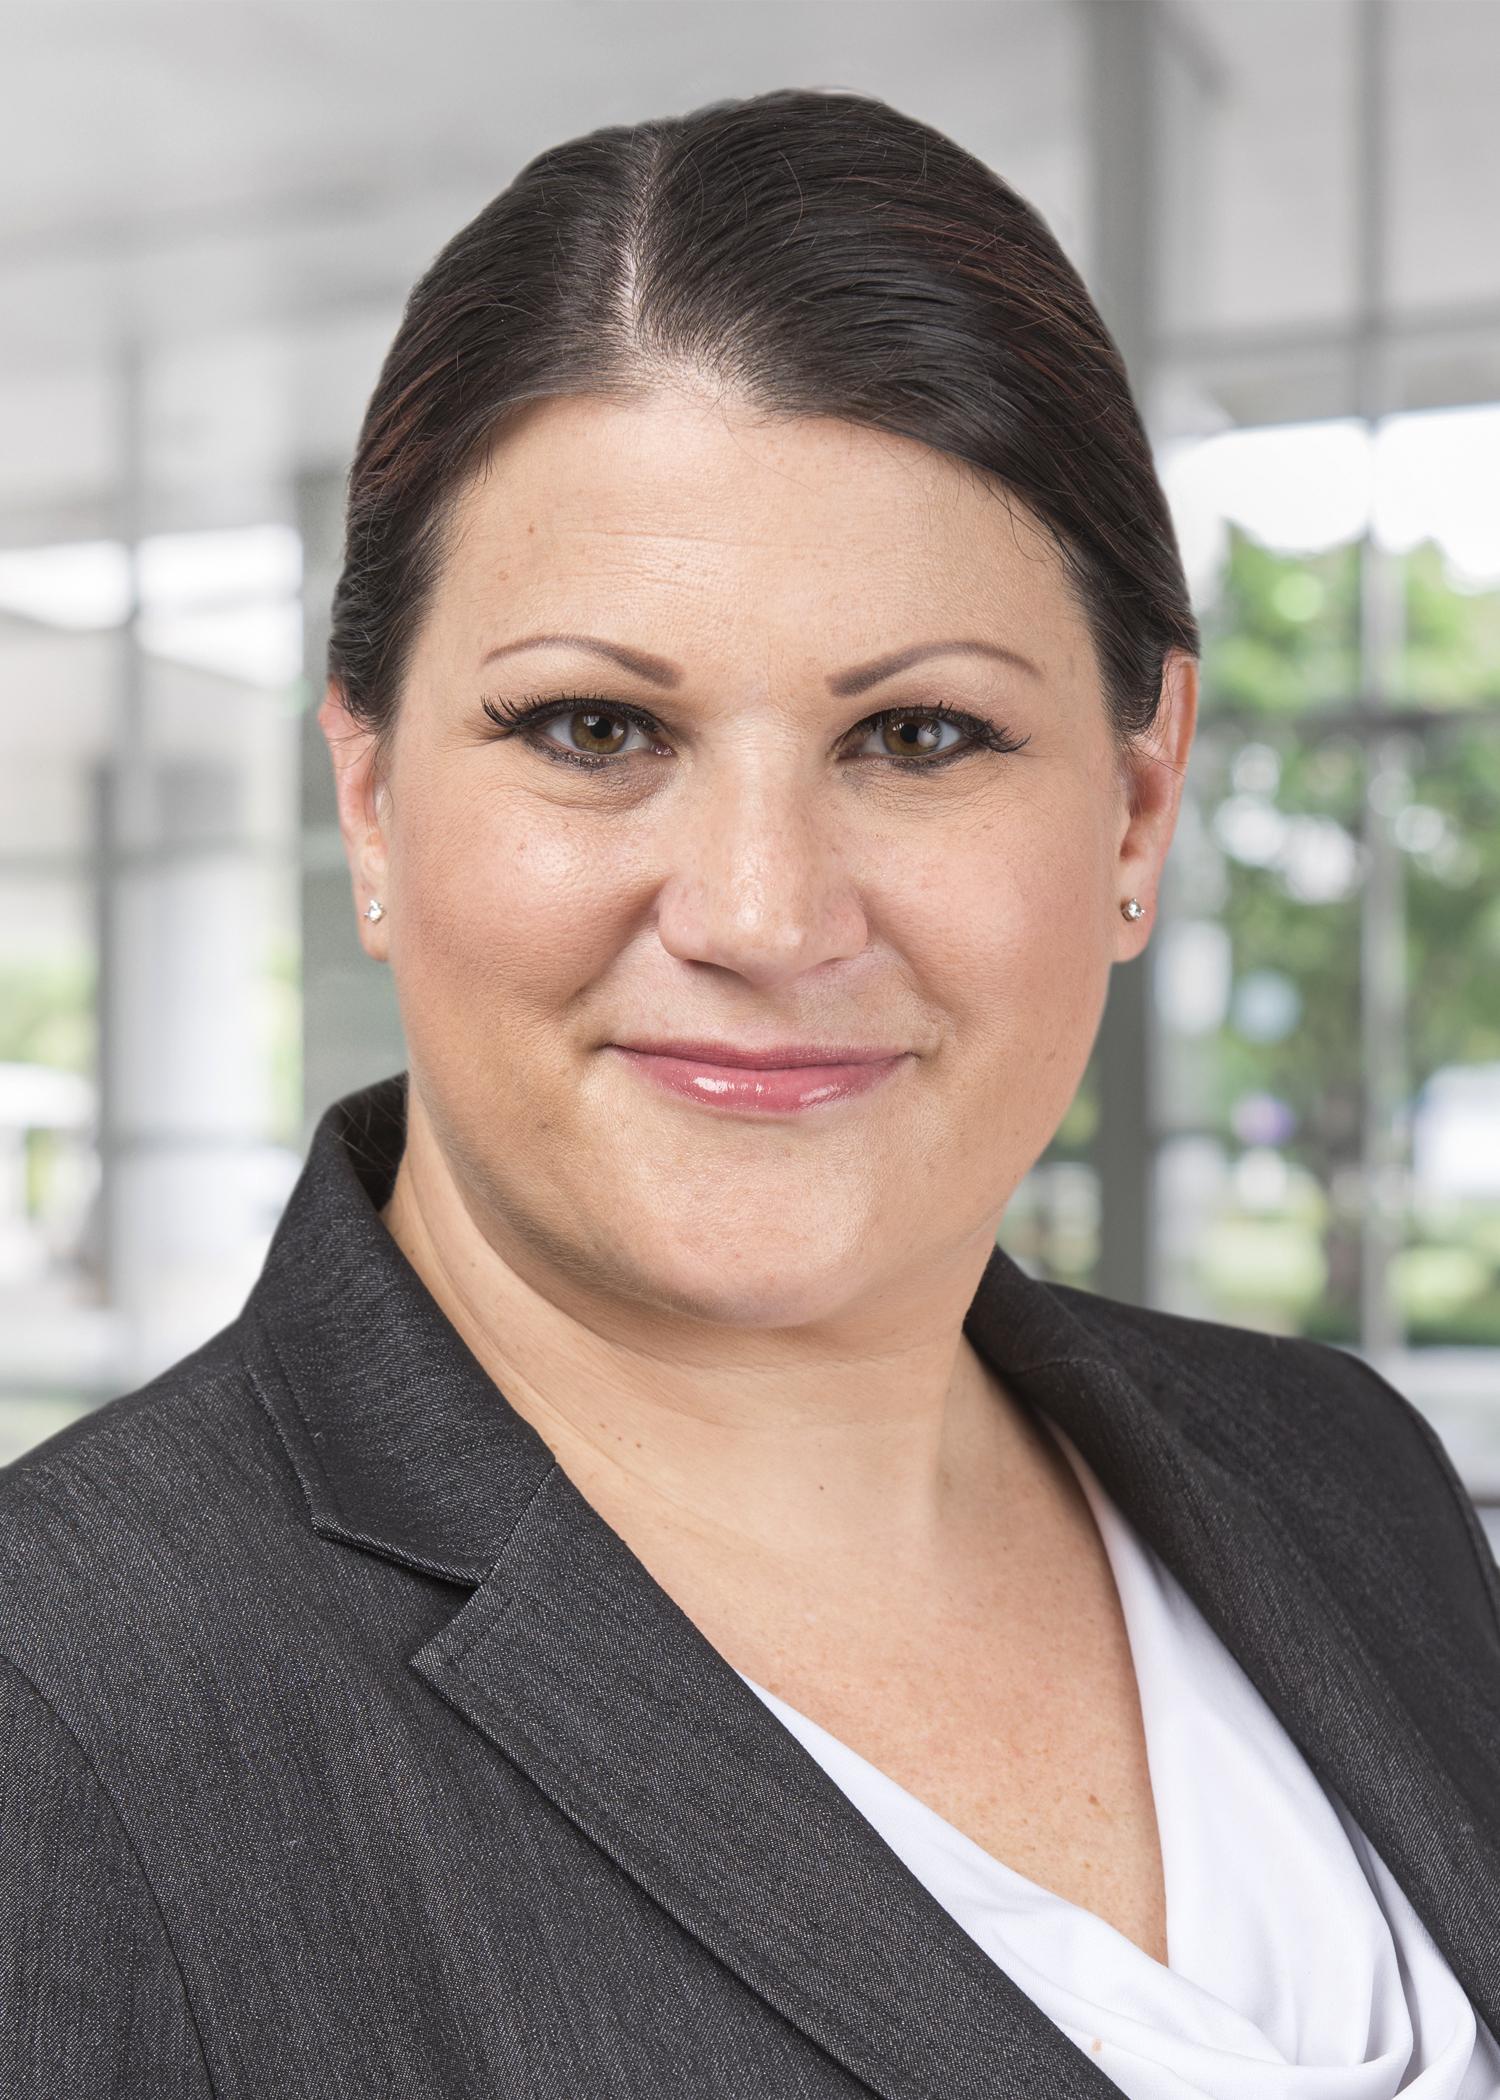 Sharon Berger